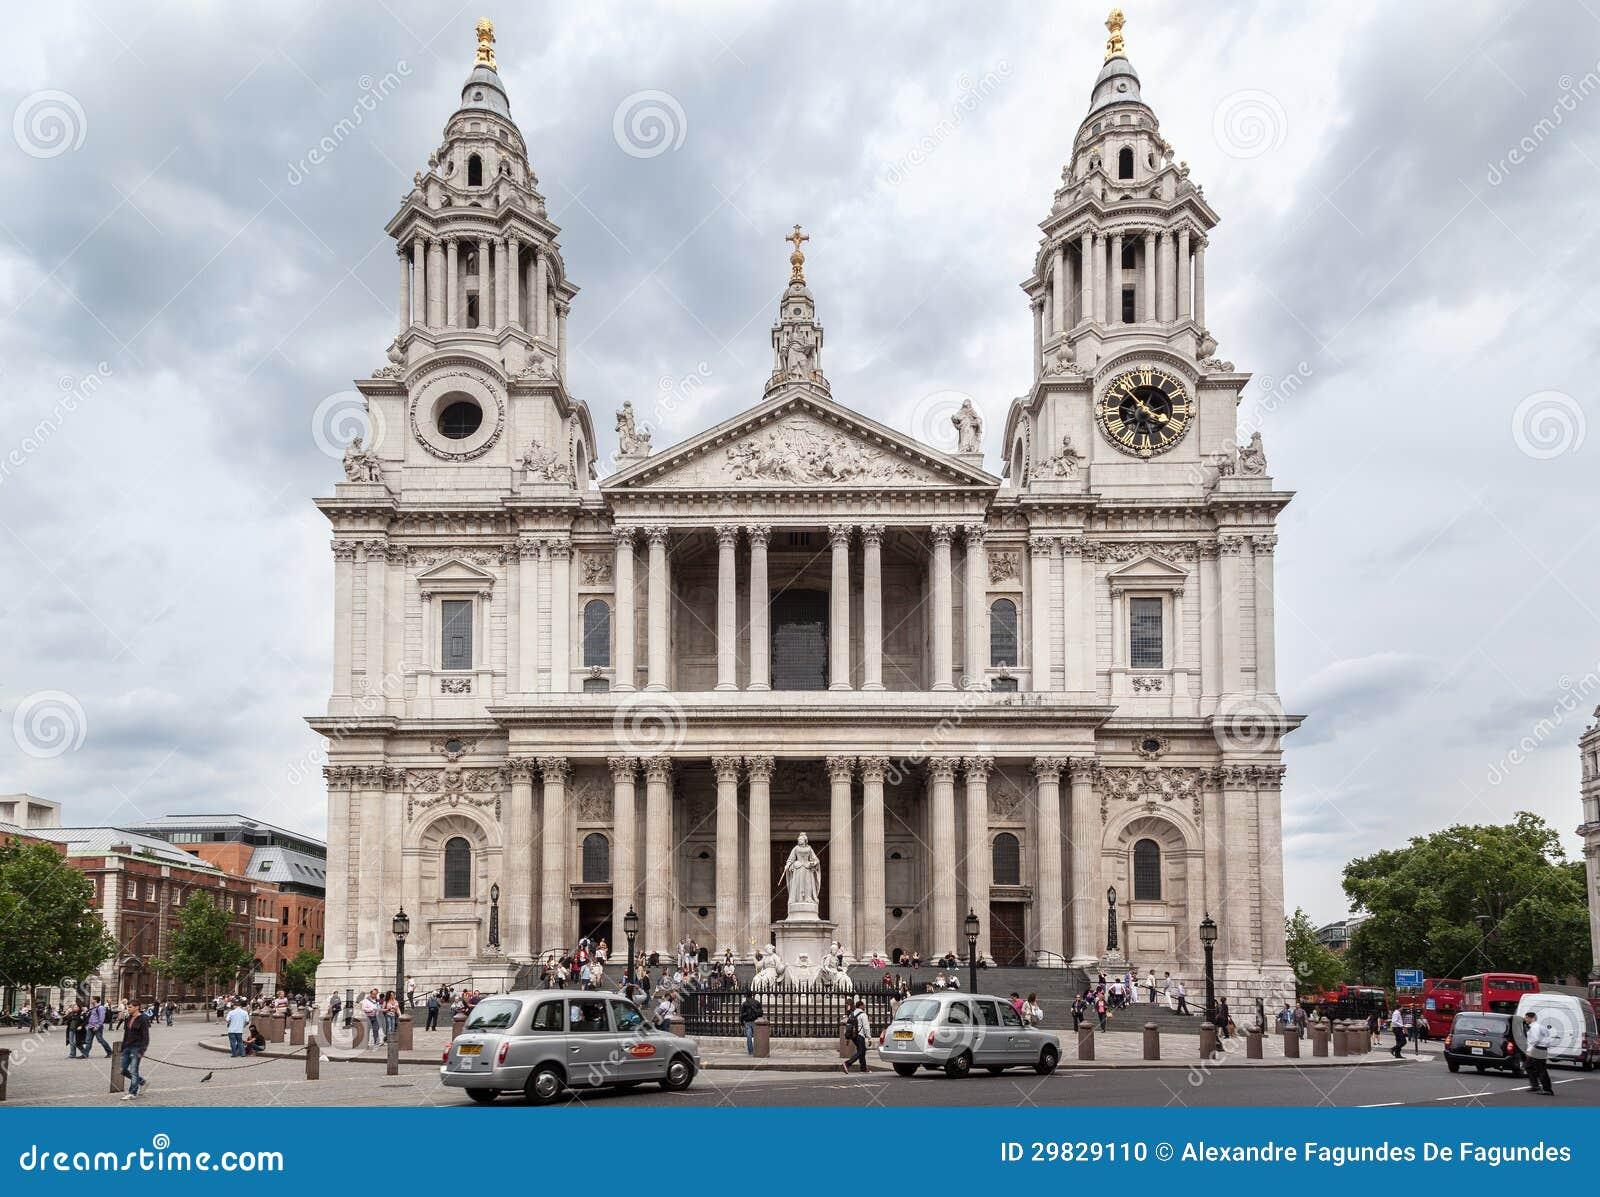 Fachada da catedral de Saint Paul